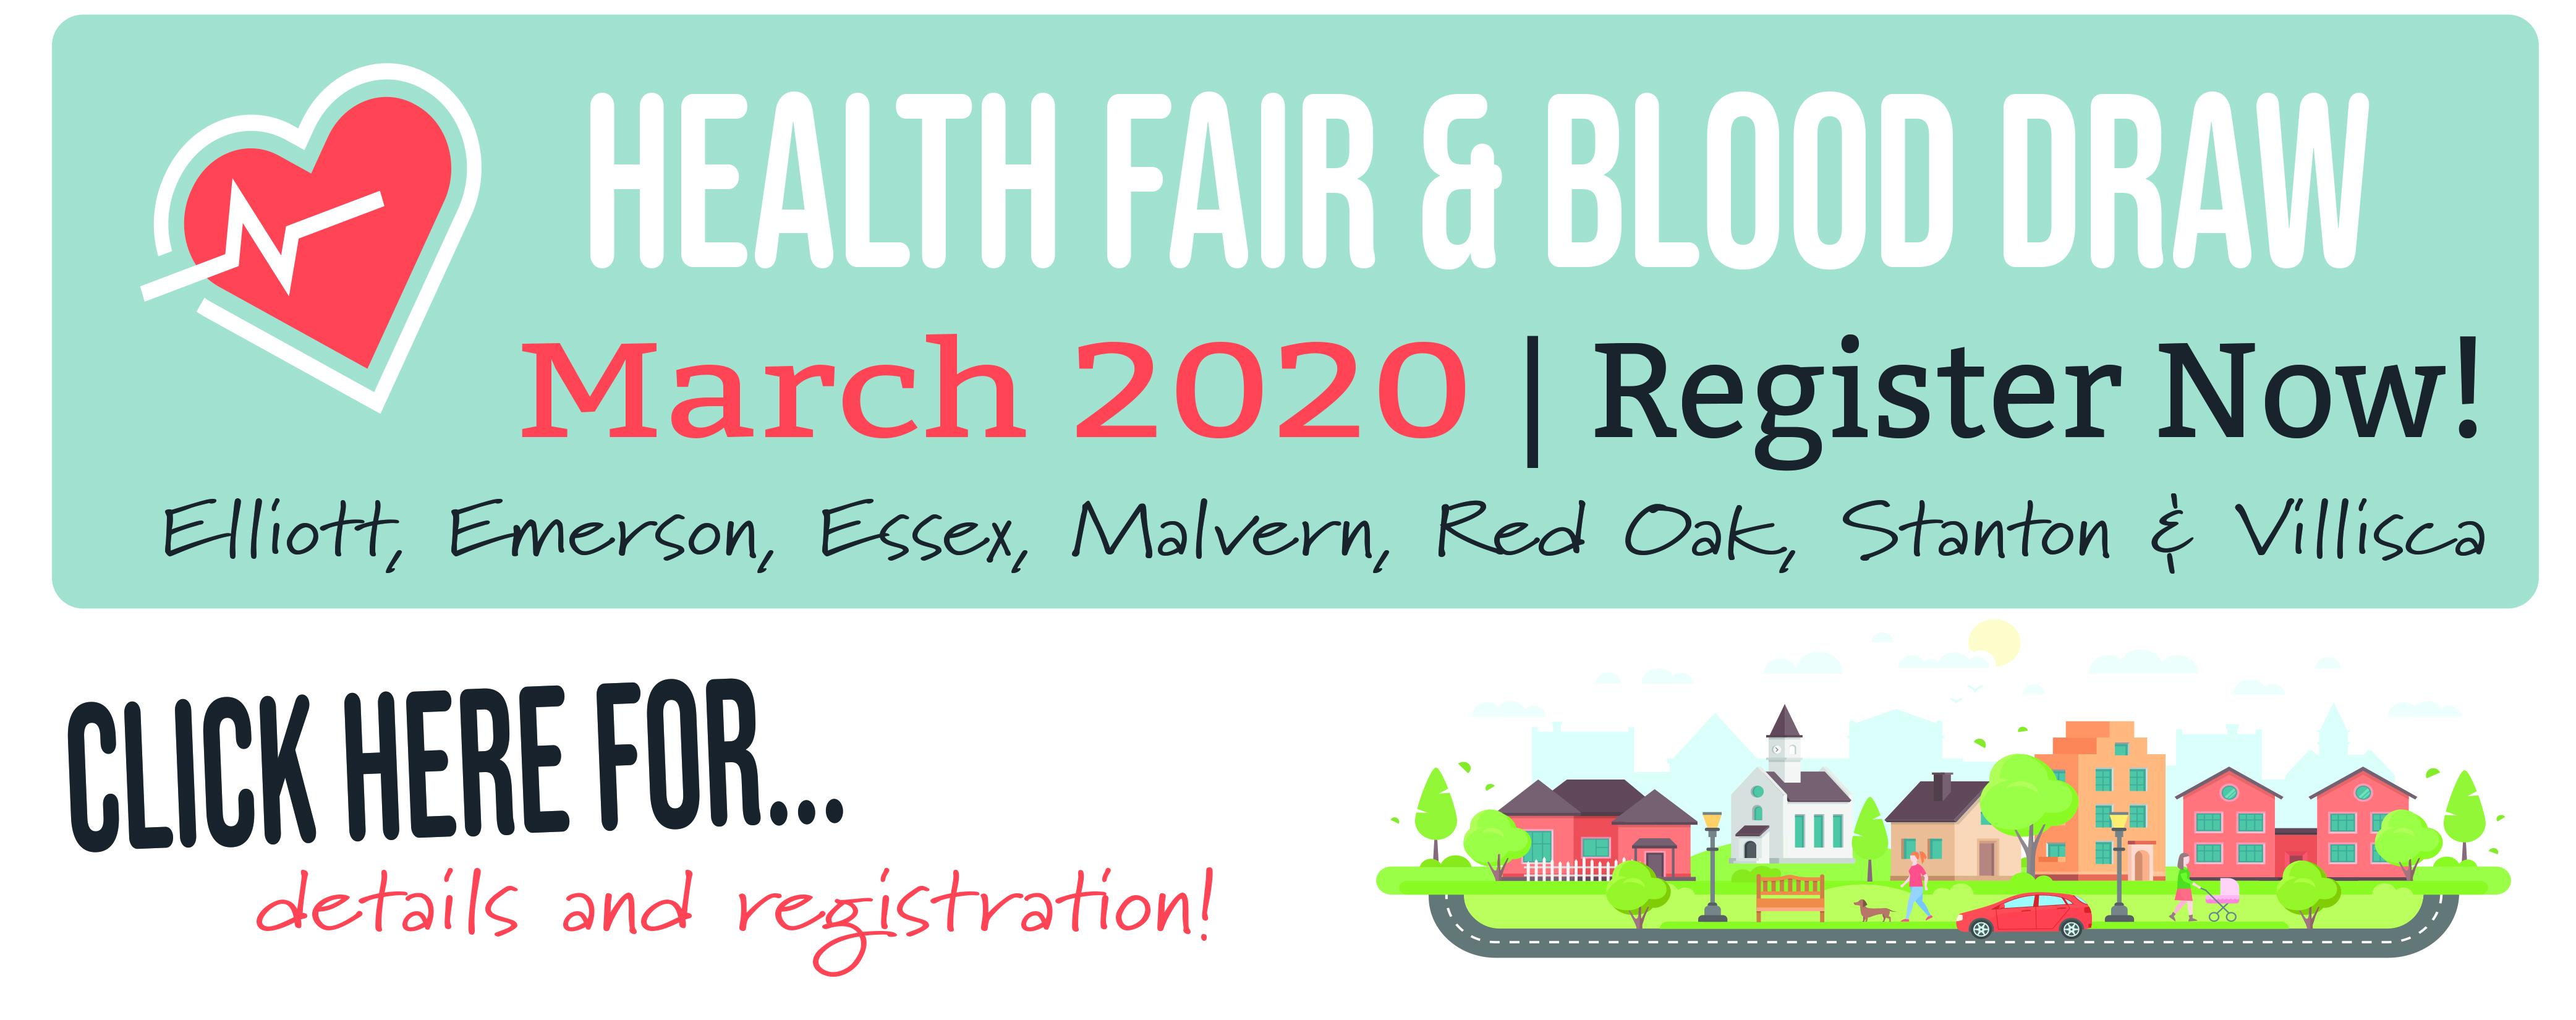 Blood Draw & Health Fair: March 2020